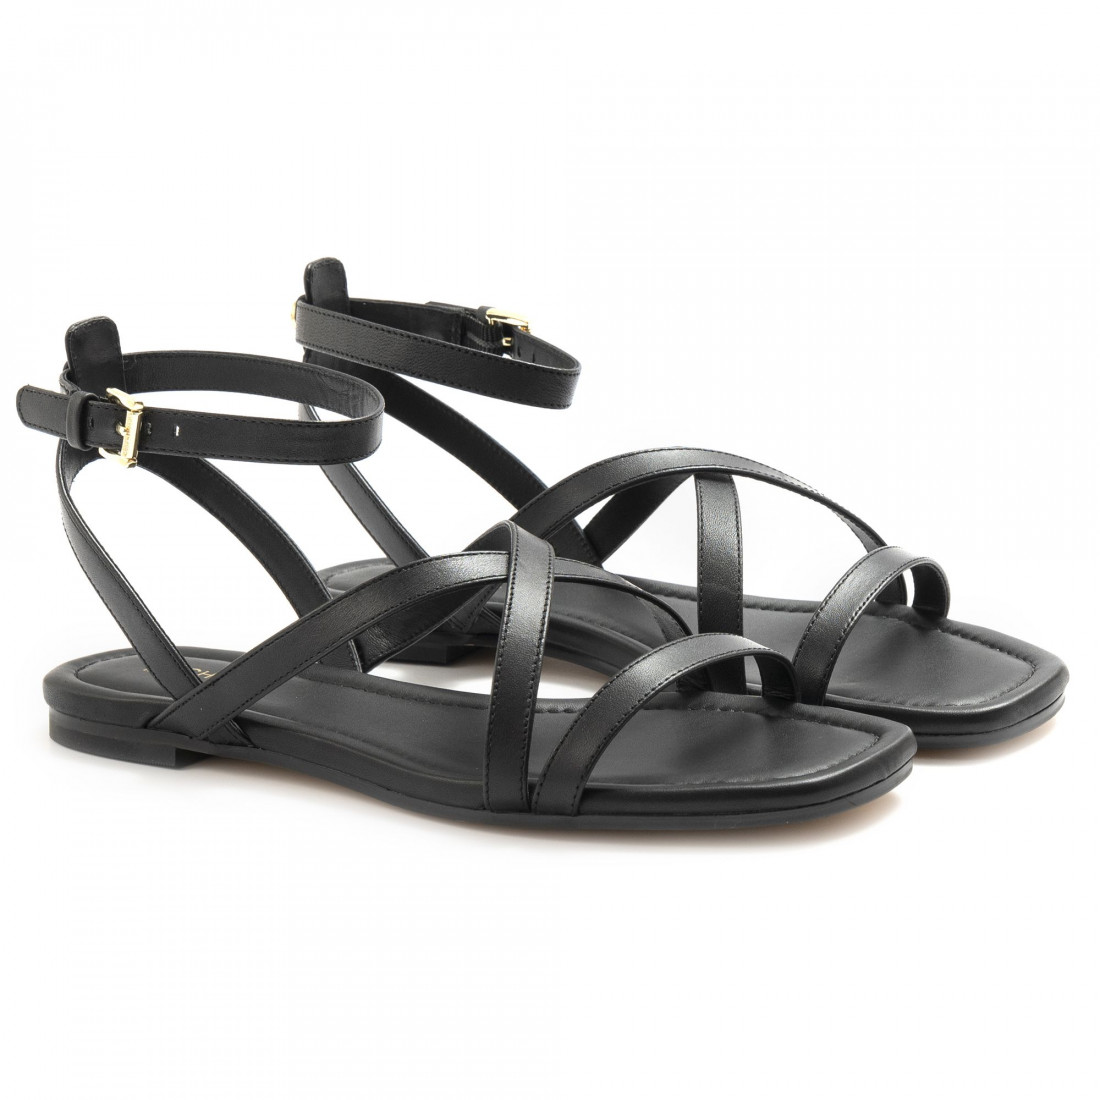 sandals woman michael kors 40s0tafa3l001 6870